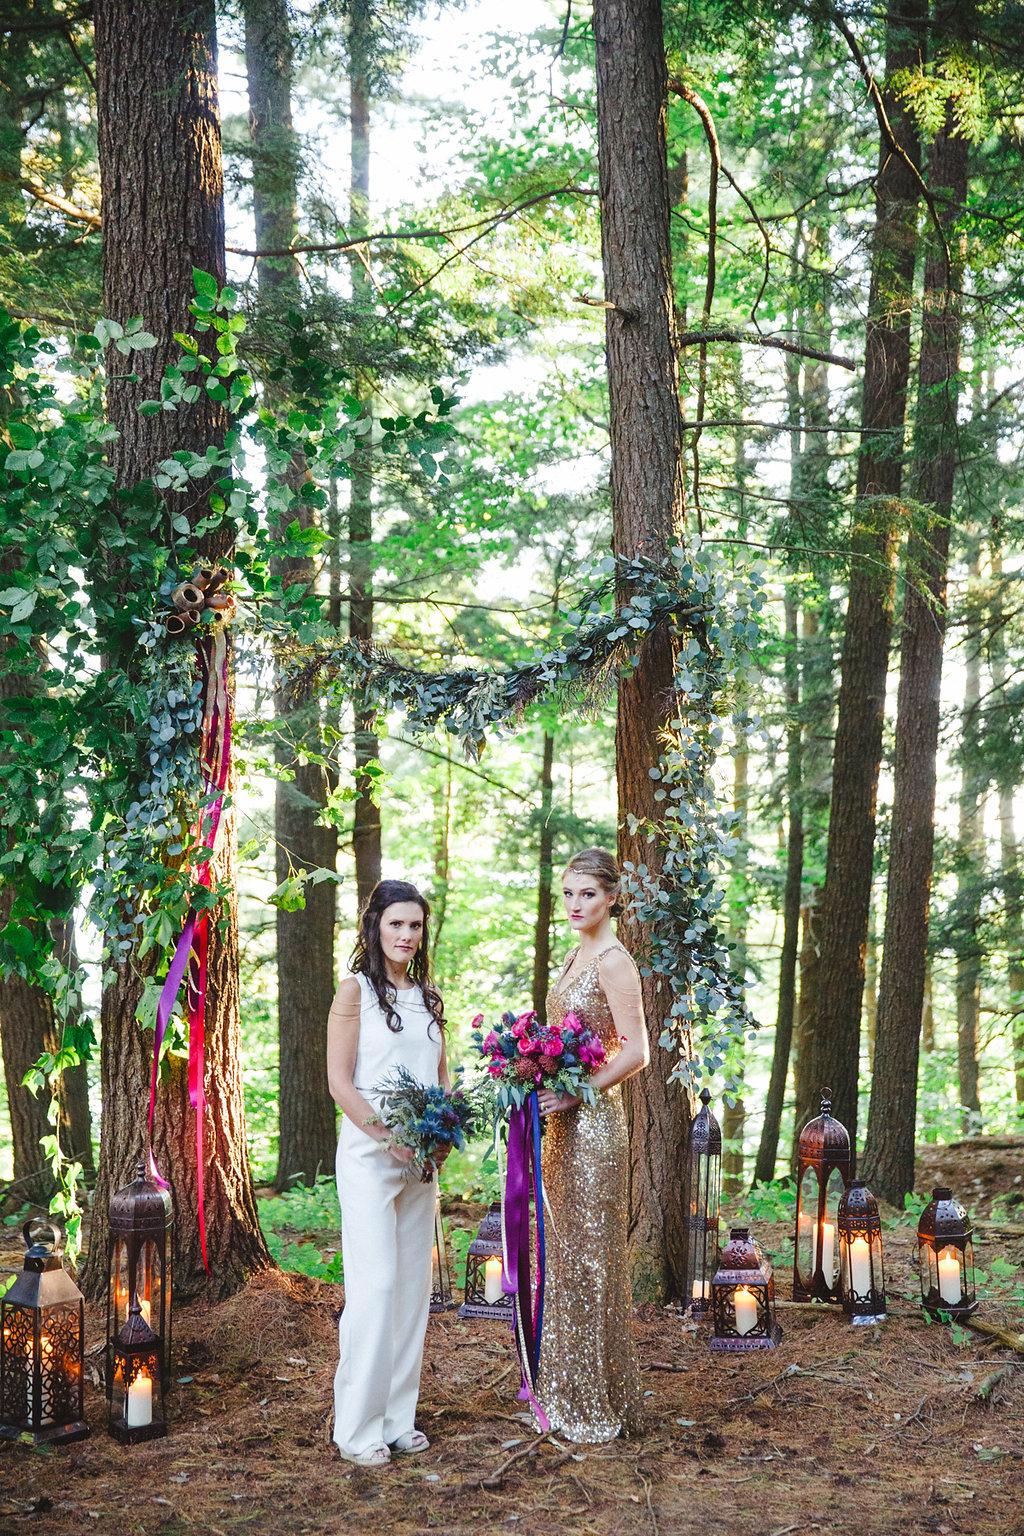 Jewel_Tone_Bohemian_Wedding_Magnolia_Studios-047.jpg